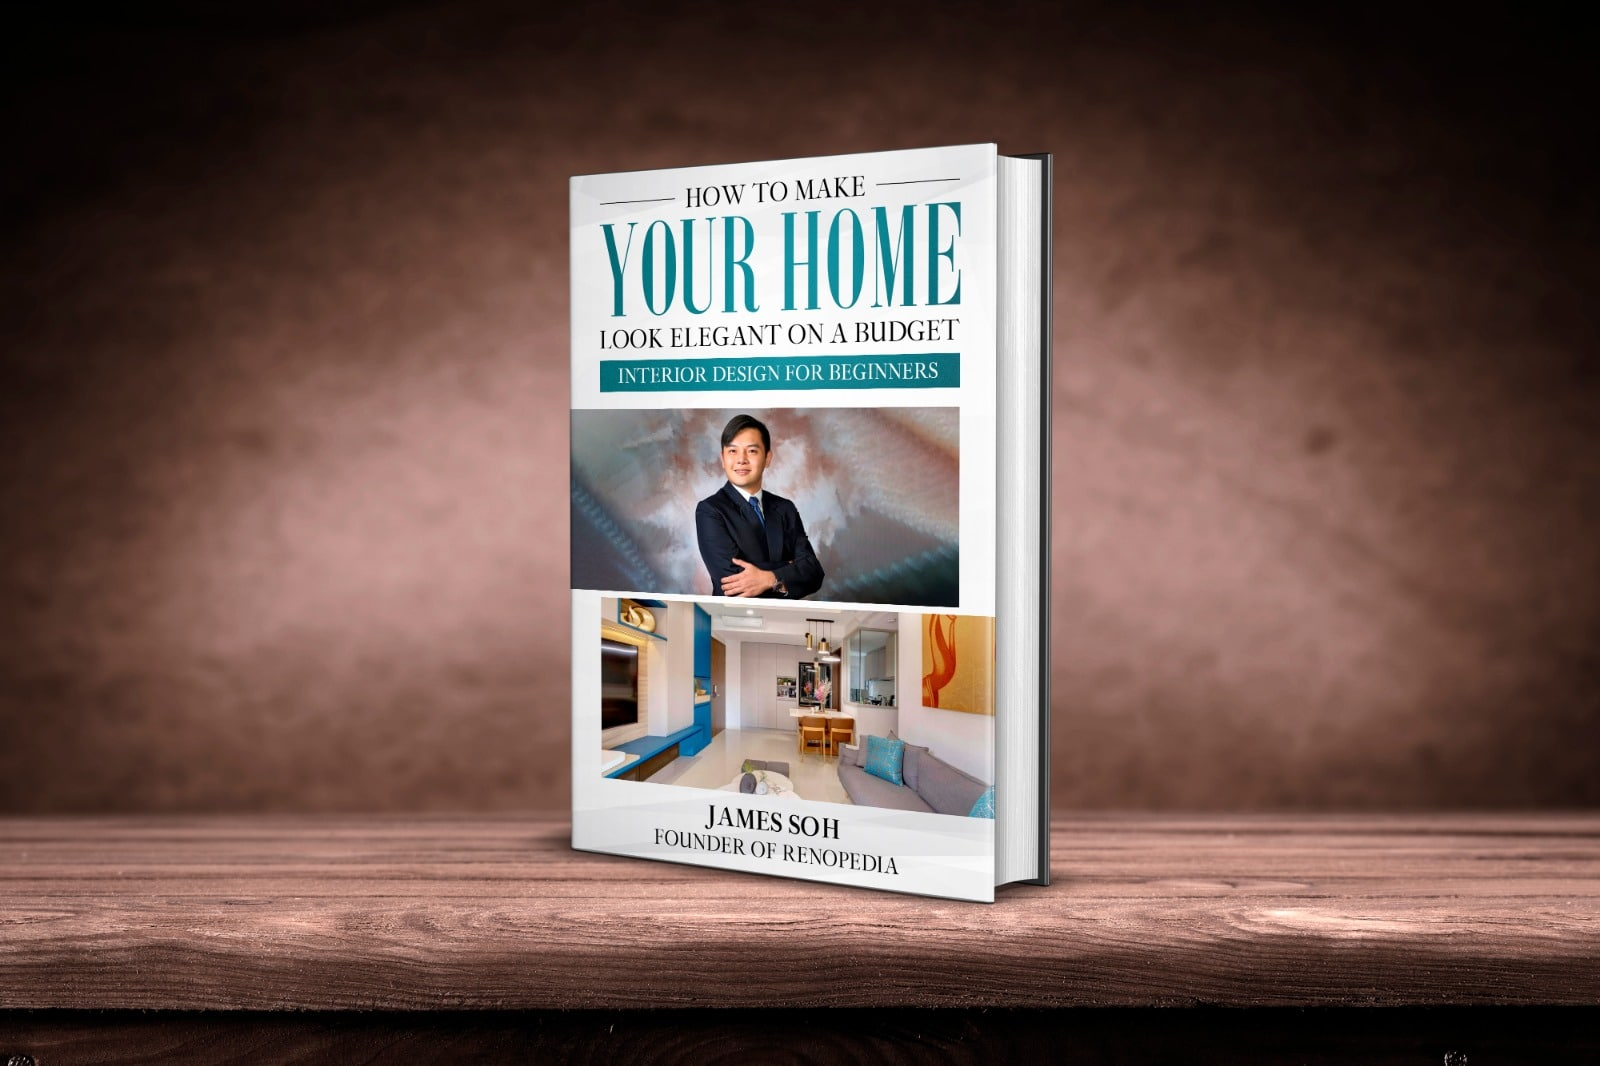 James Soh's Book, Interior Design for Beginners